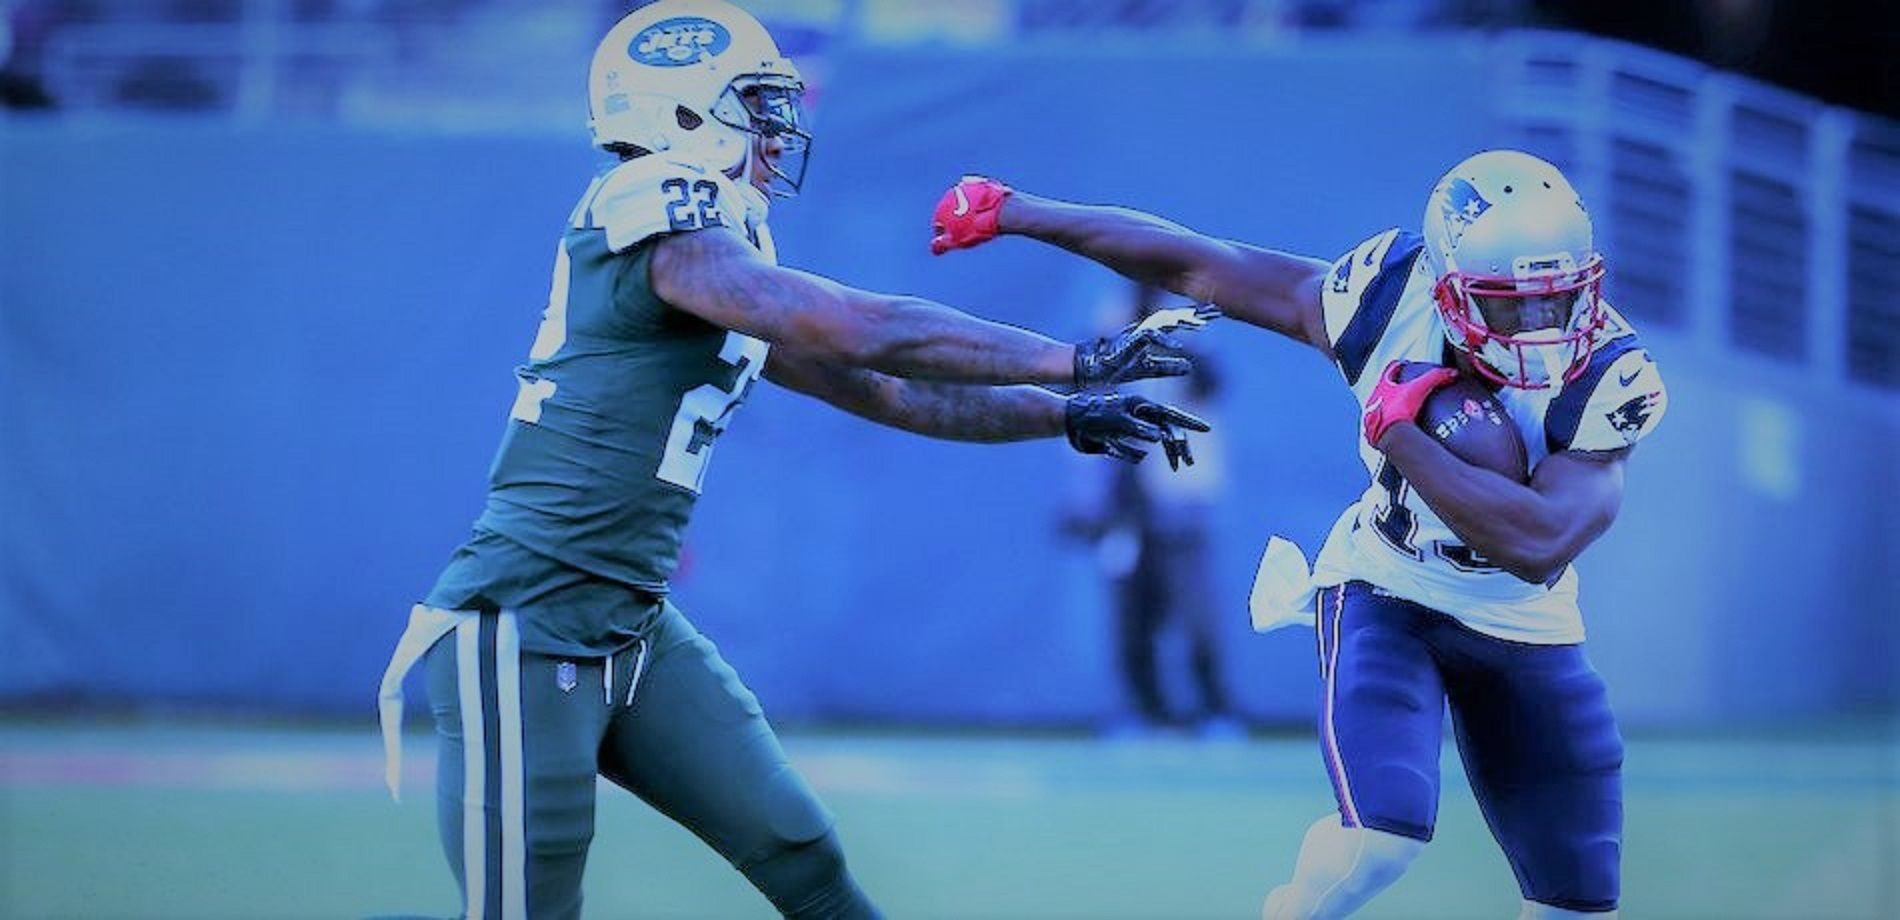 New York Jets vs. New England Patriots Live Streaming